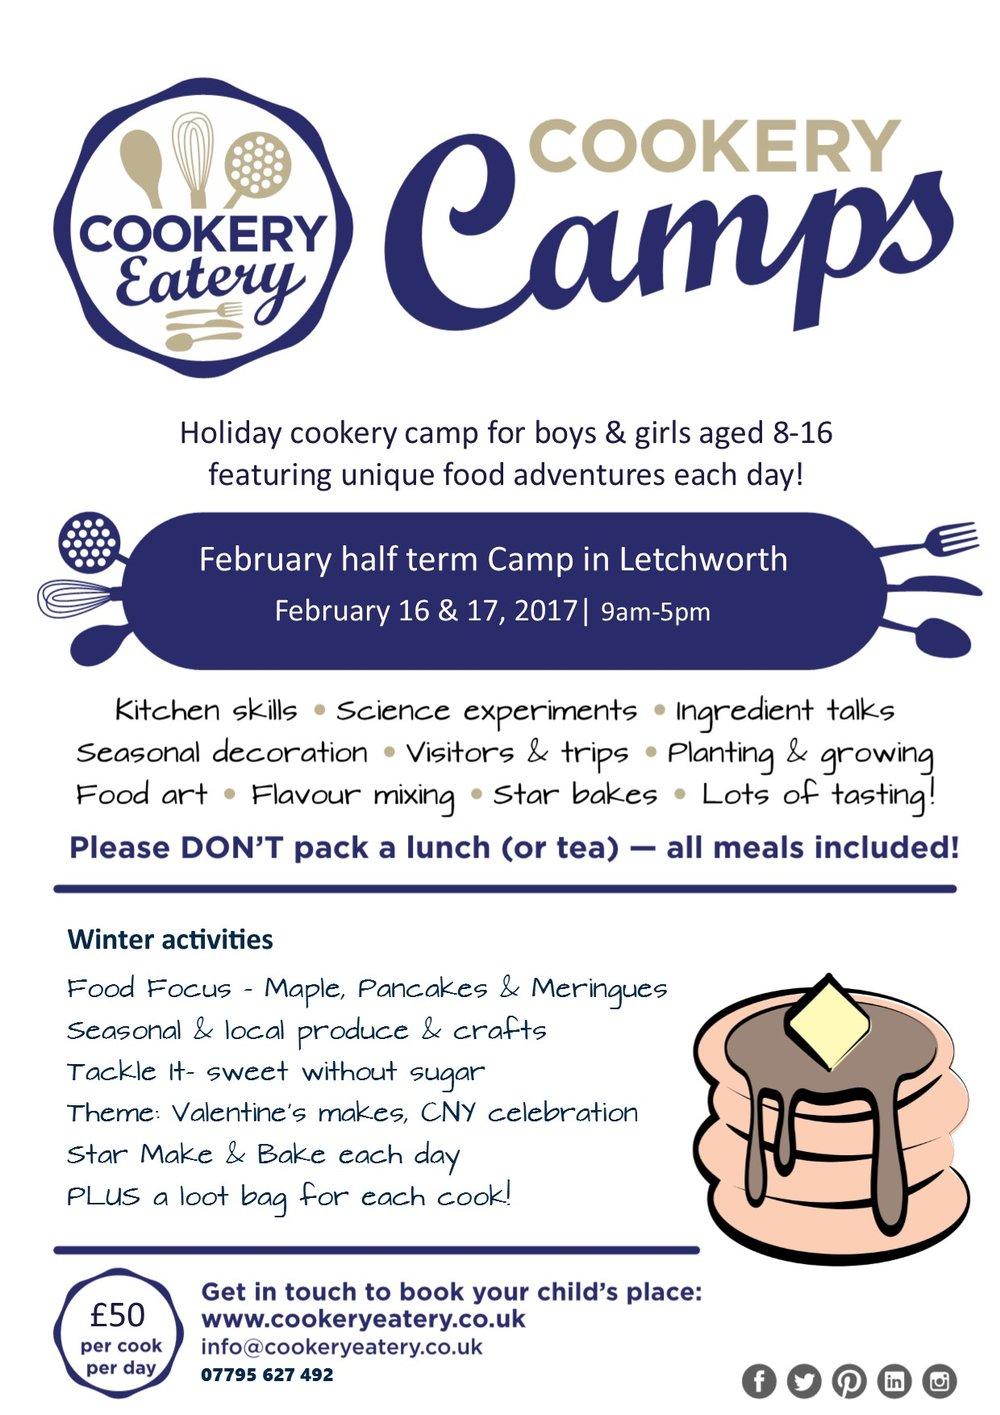 Cookery Camp.February half term 2017.Letchworth.FLYER.jpg